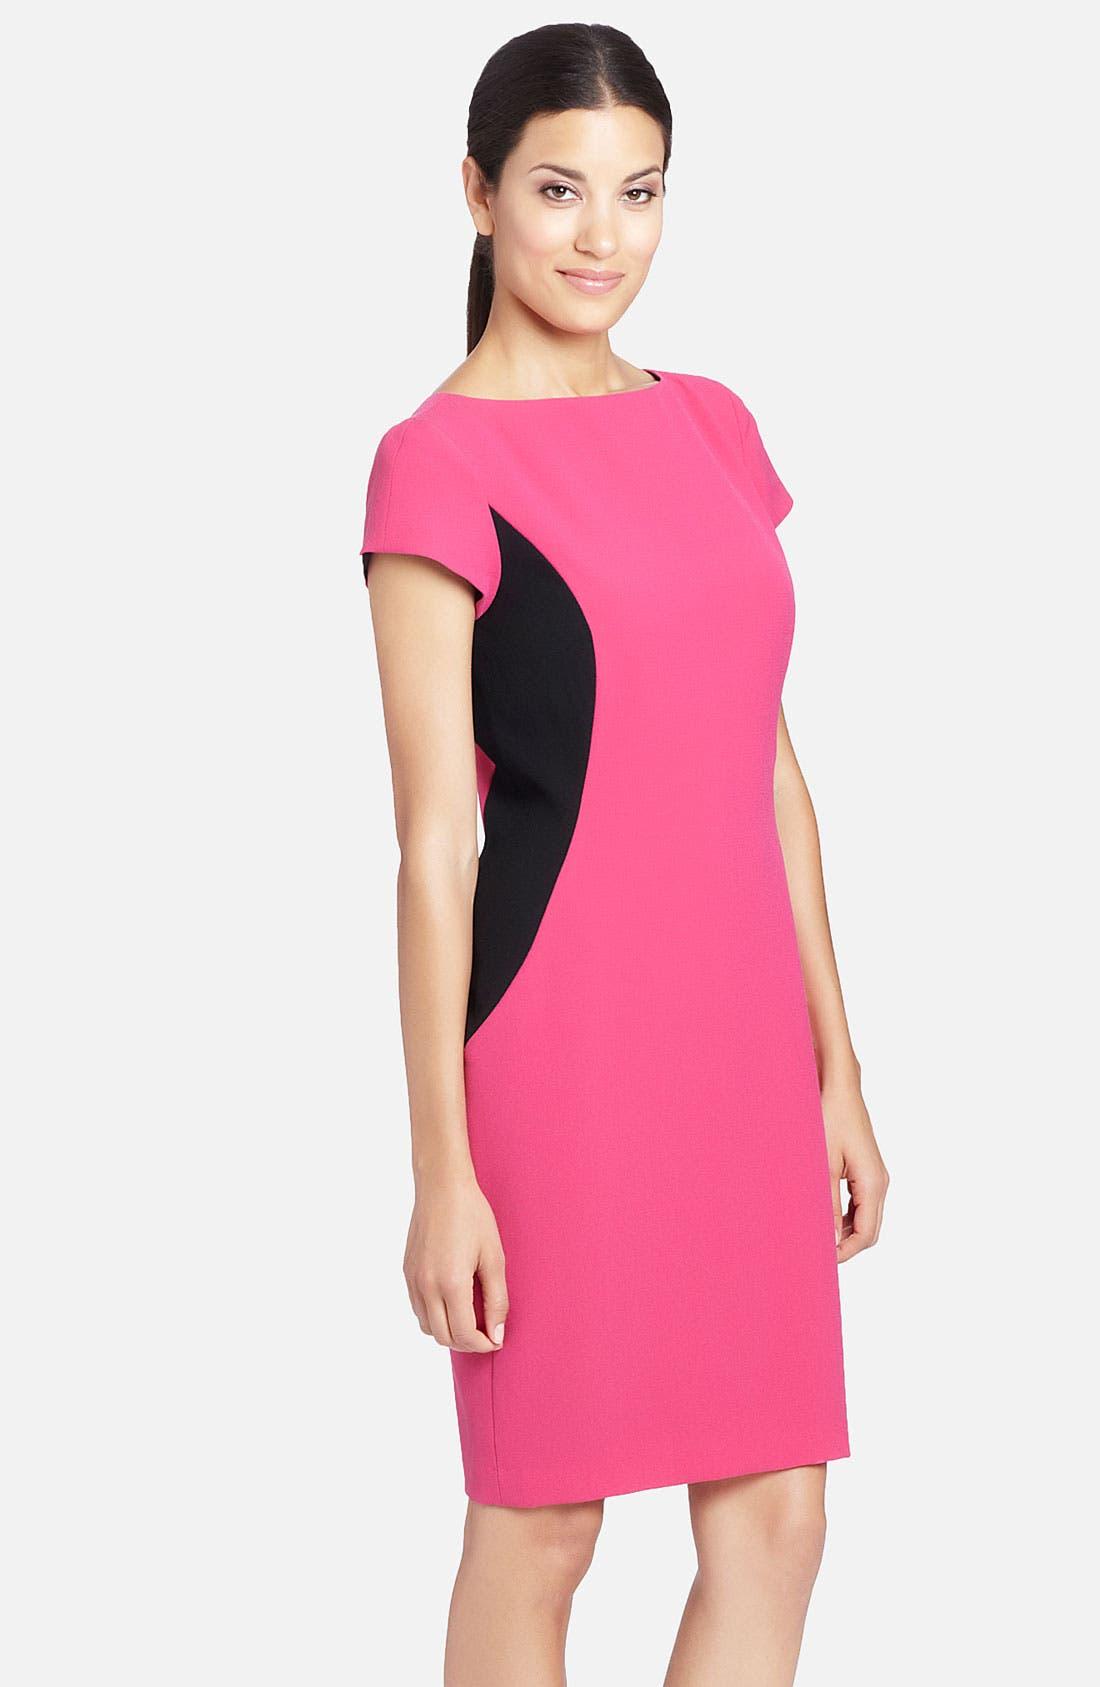 Main Image - Cynthia Steffe 'Lida' Contrast Side Panel Crepe Sheath Dress